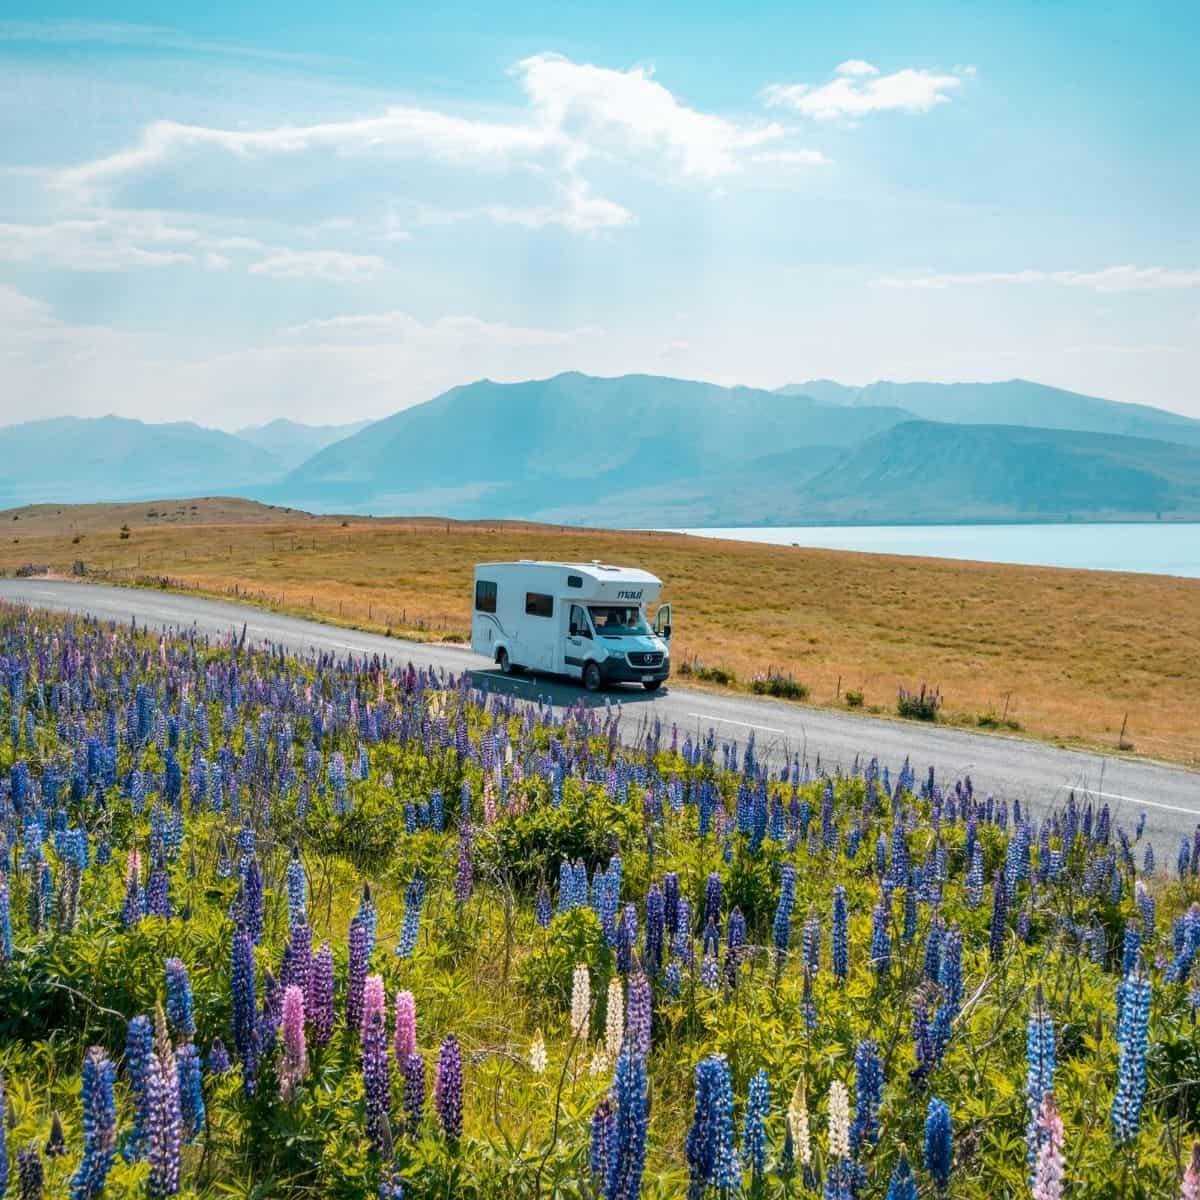 Mengenal 8 Destinasi Wisata Alam dan City Tour Populer di New Zealand